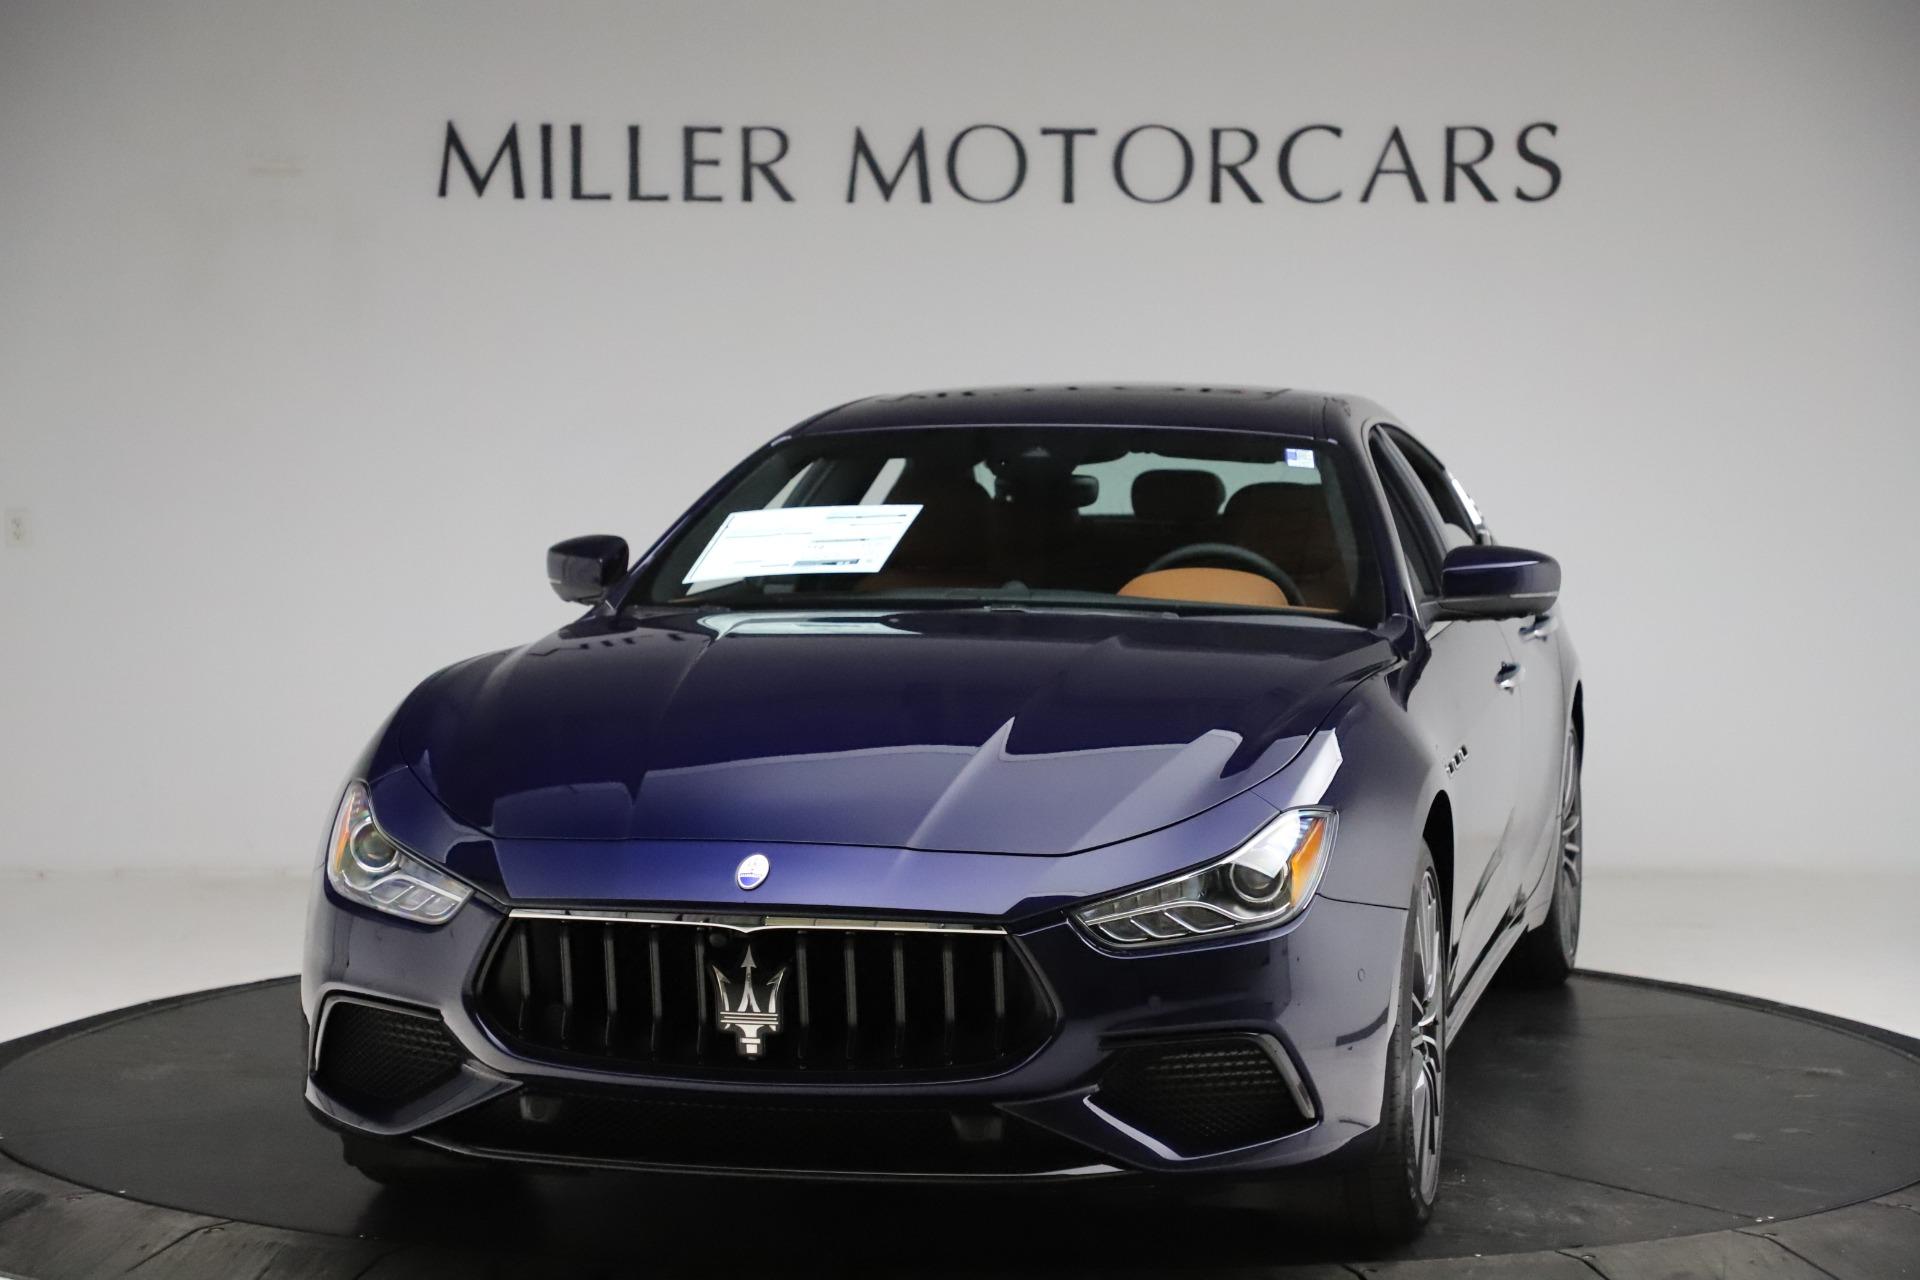 New 2021 Maserati Ghibli S Q4 for sale $90,925 at Rolls-Royce Motor Cars Greenwich in Greenwich CT 06830 1